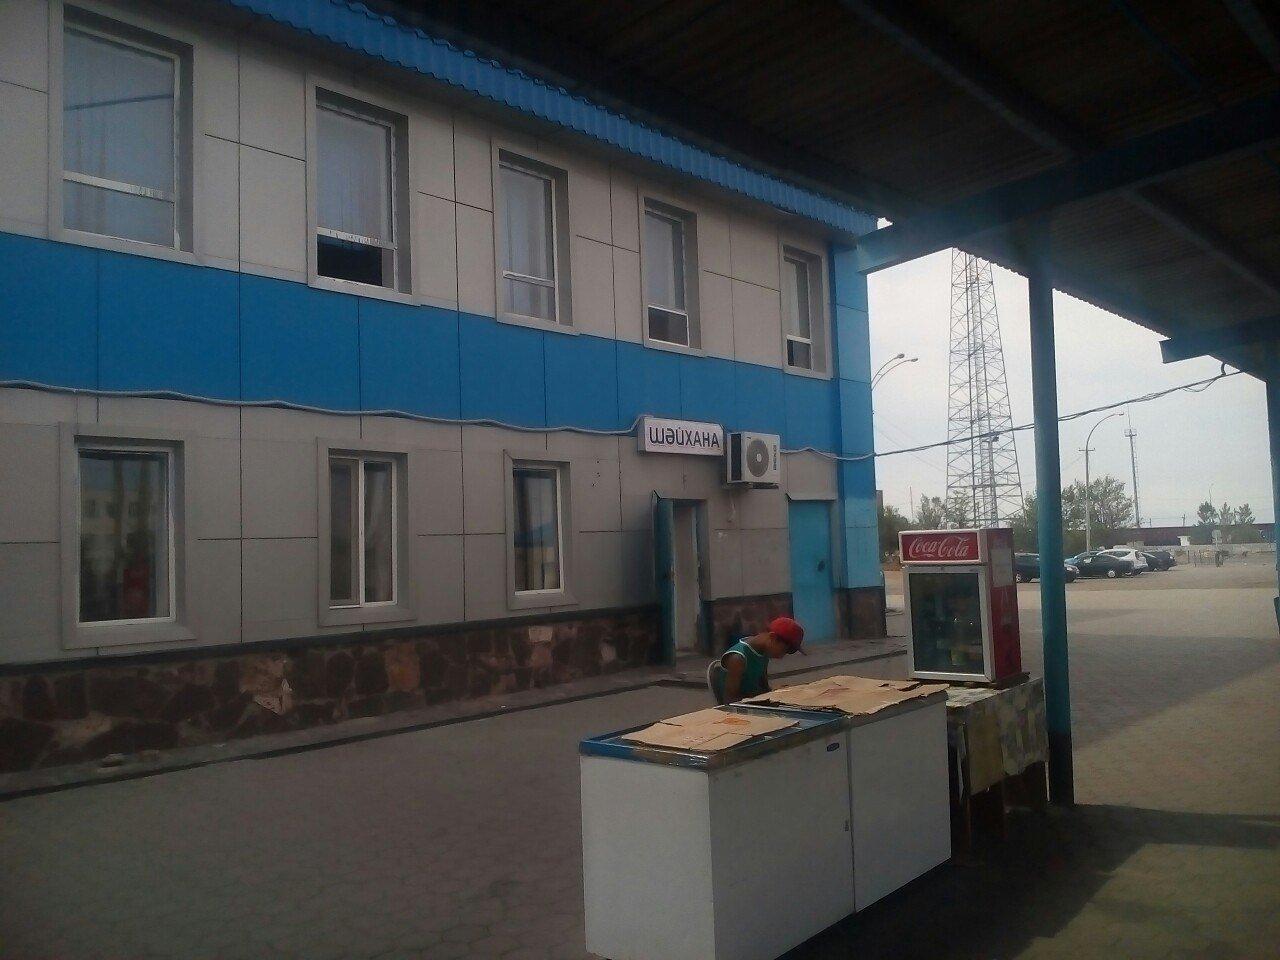 Фото чай1.jpg. Казахстан, Карагандинская область, Жезказган, улица Гурбы